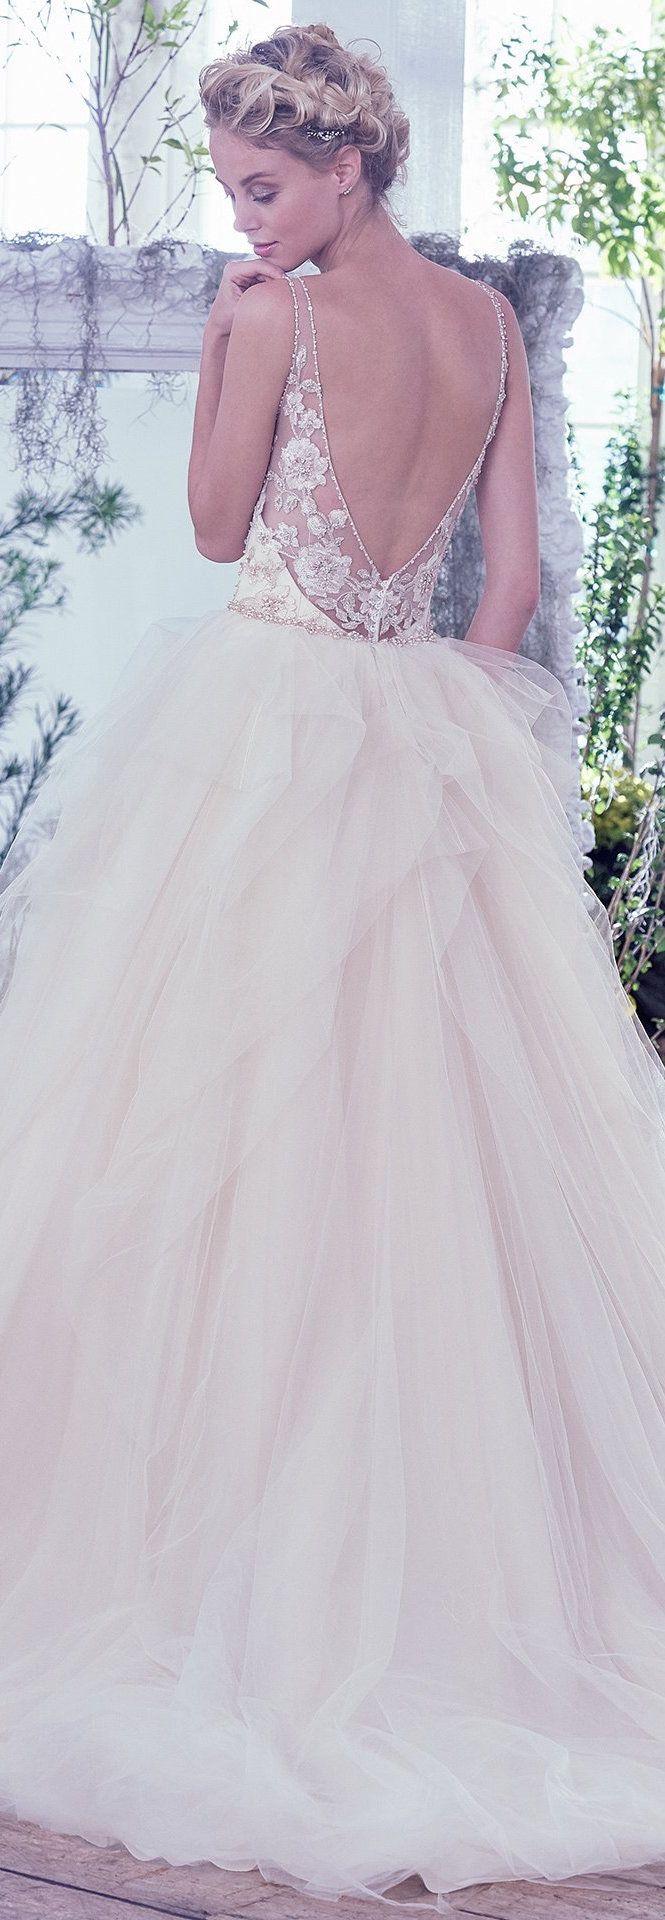 Wedding Dress by Maggie Sottero 2016 Fall/Winter Collection - Carlota   #maggiesottero #maggiebride